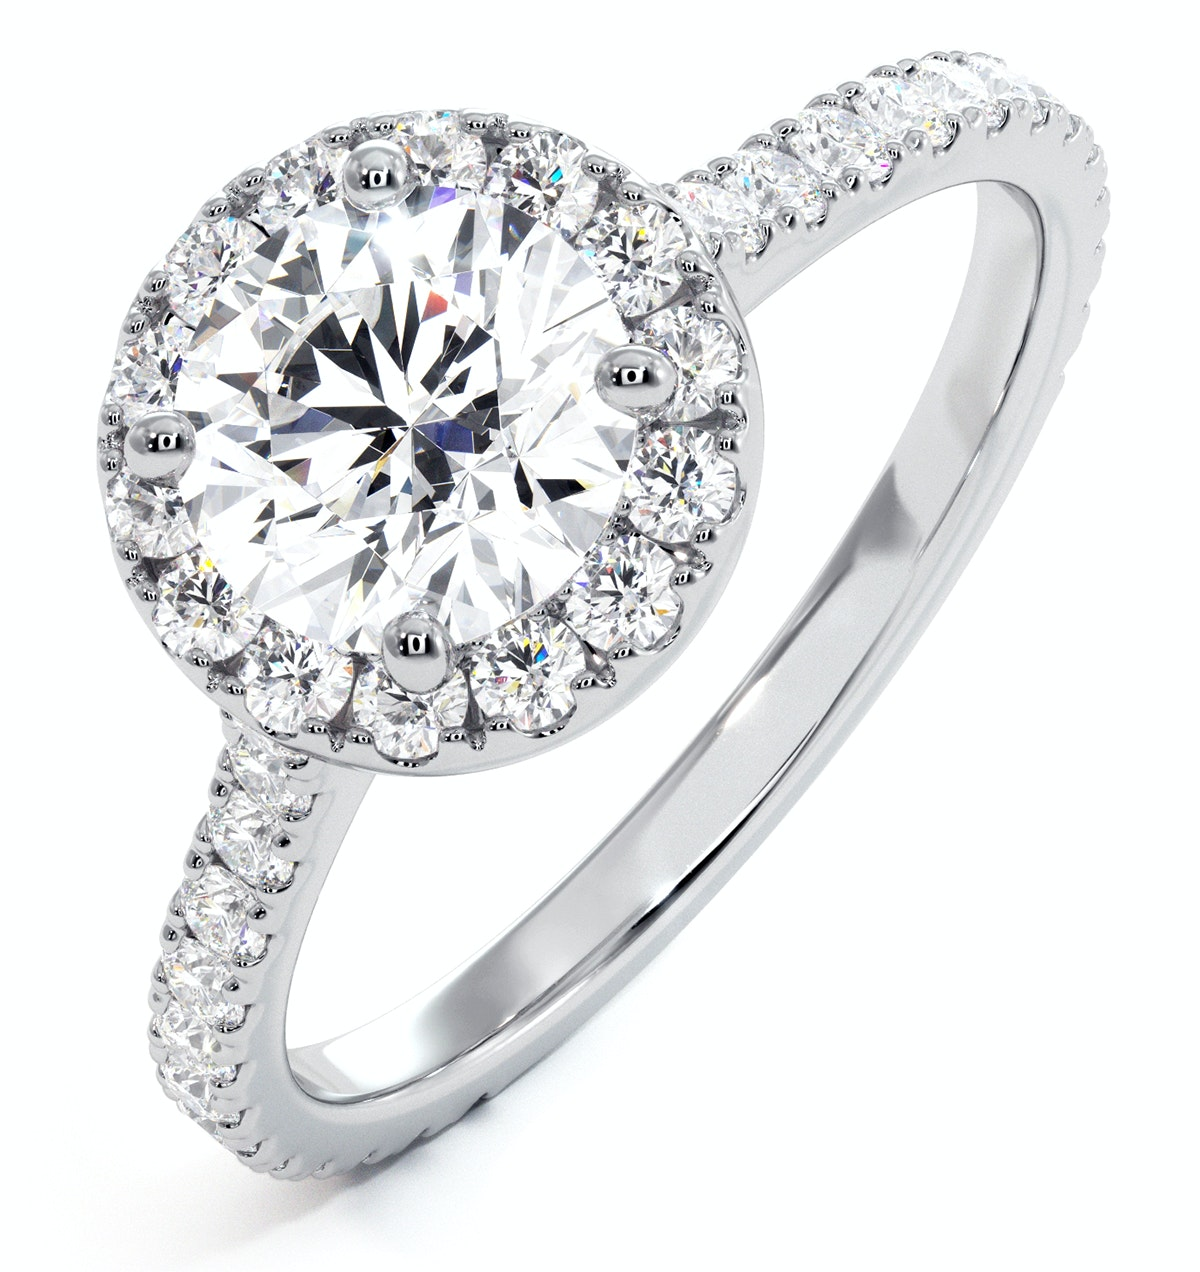 Reina GIA Diamond Halo Engagement Ring in 18K White Gold 1.80ct G/VS2